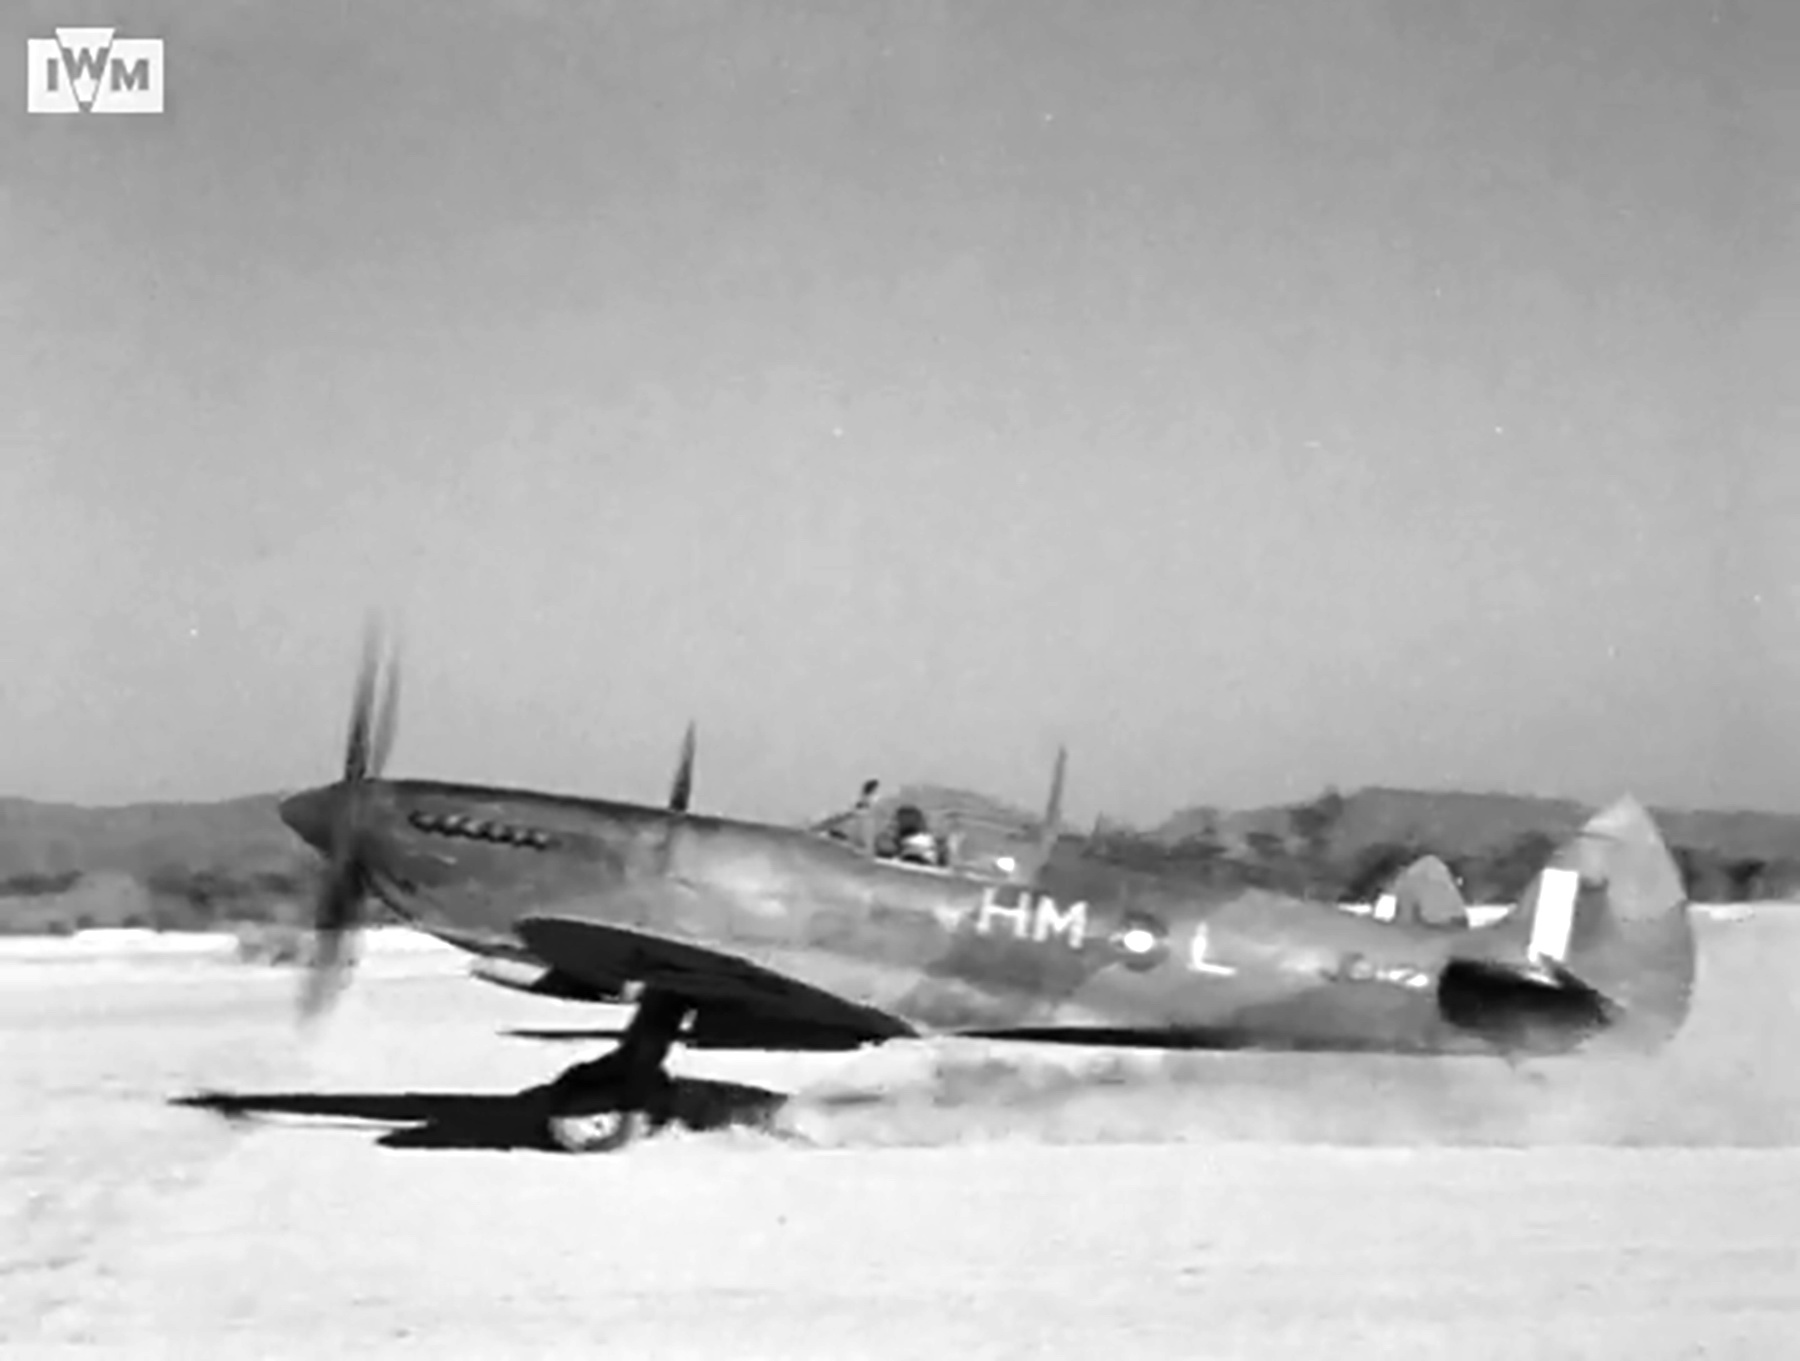 Spitfire VIII RAF 136Sqn HML JG112 at Rumkhapalong operating over Burma CBI 1944 IWM 04